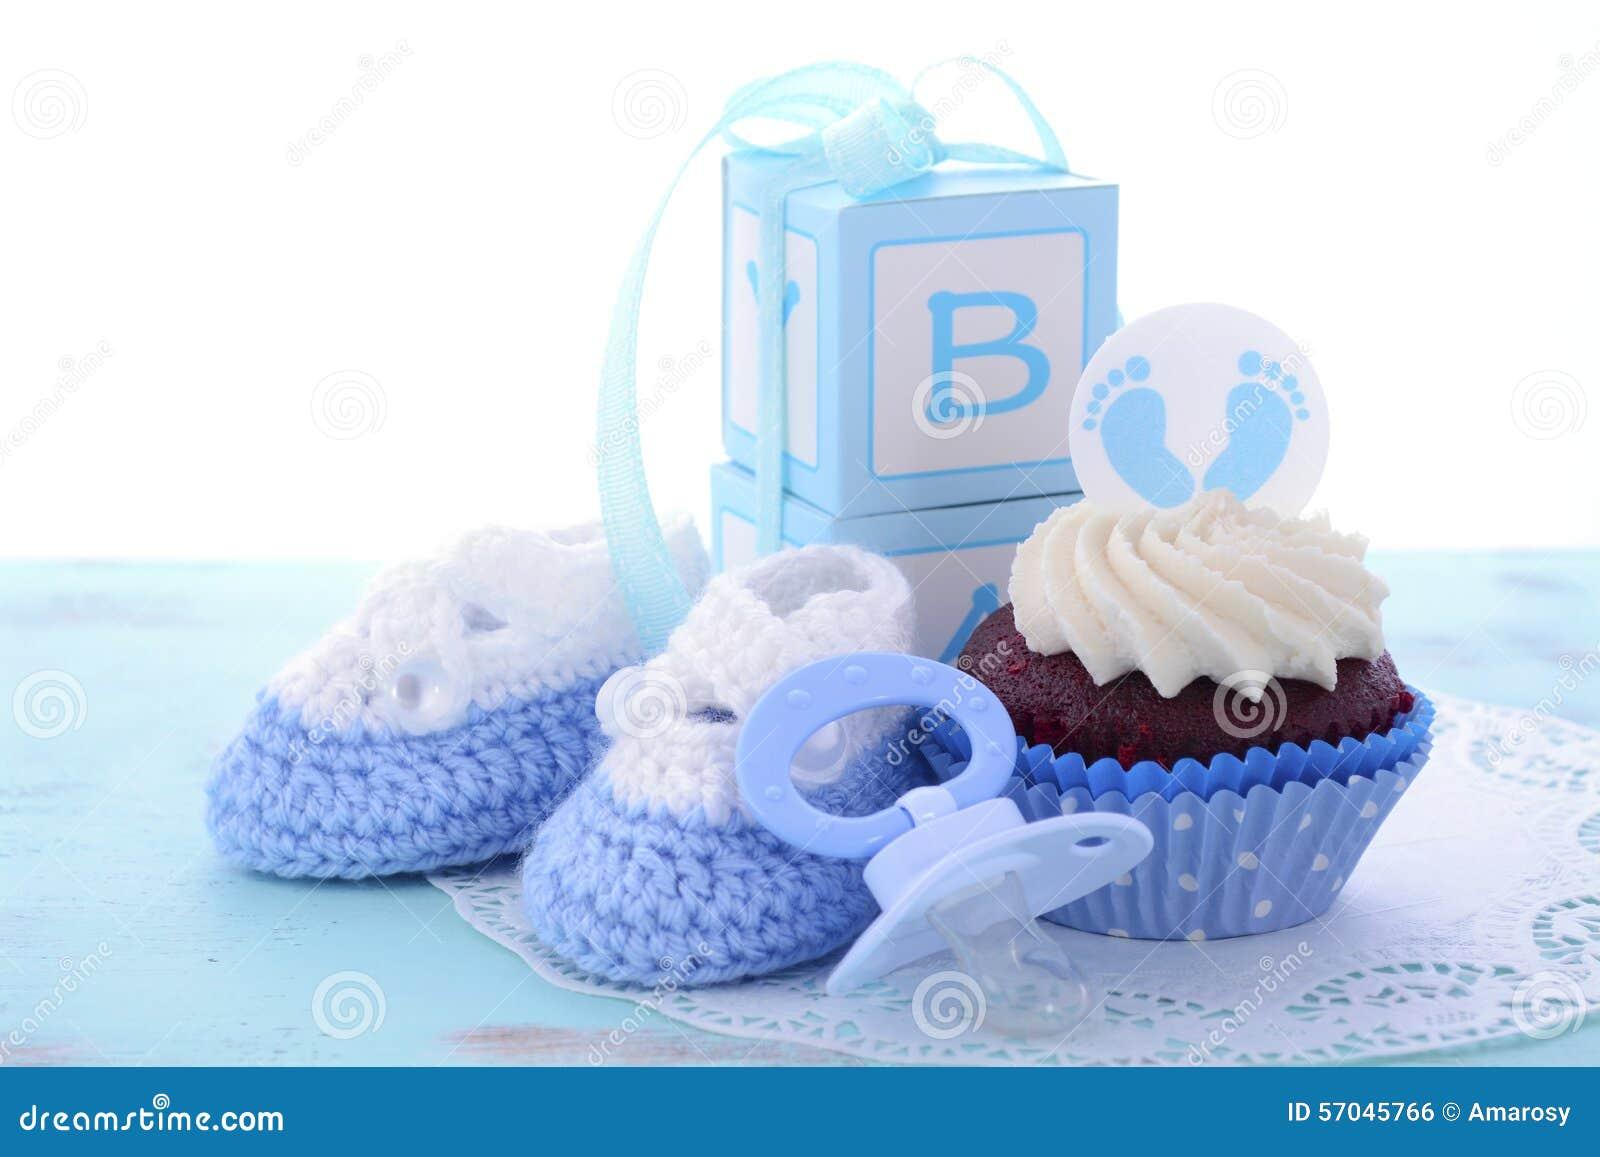 Blue Baby Feet Cake Decorations